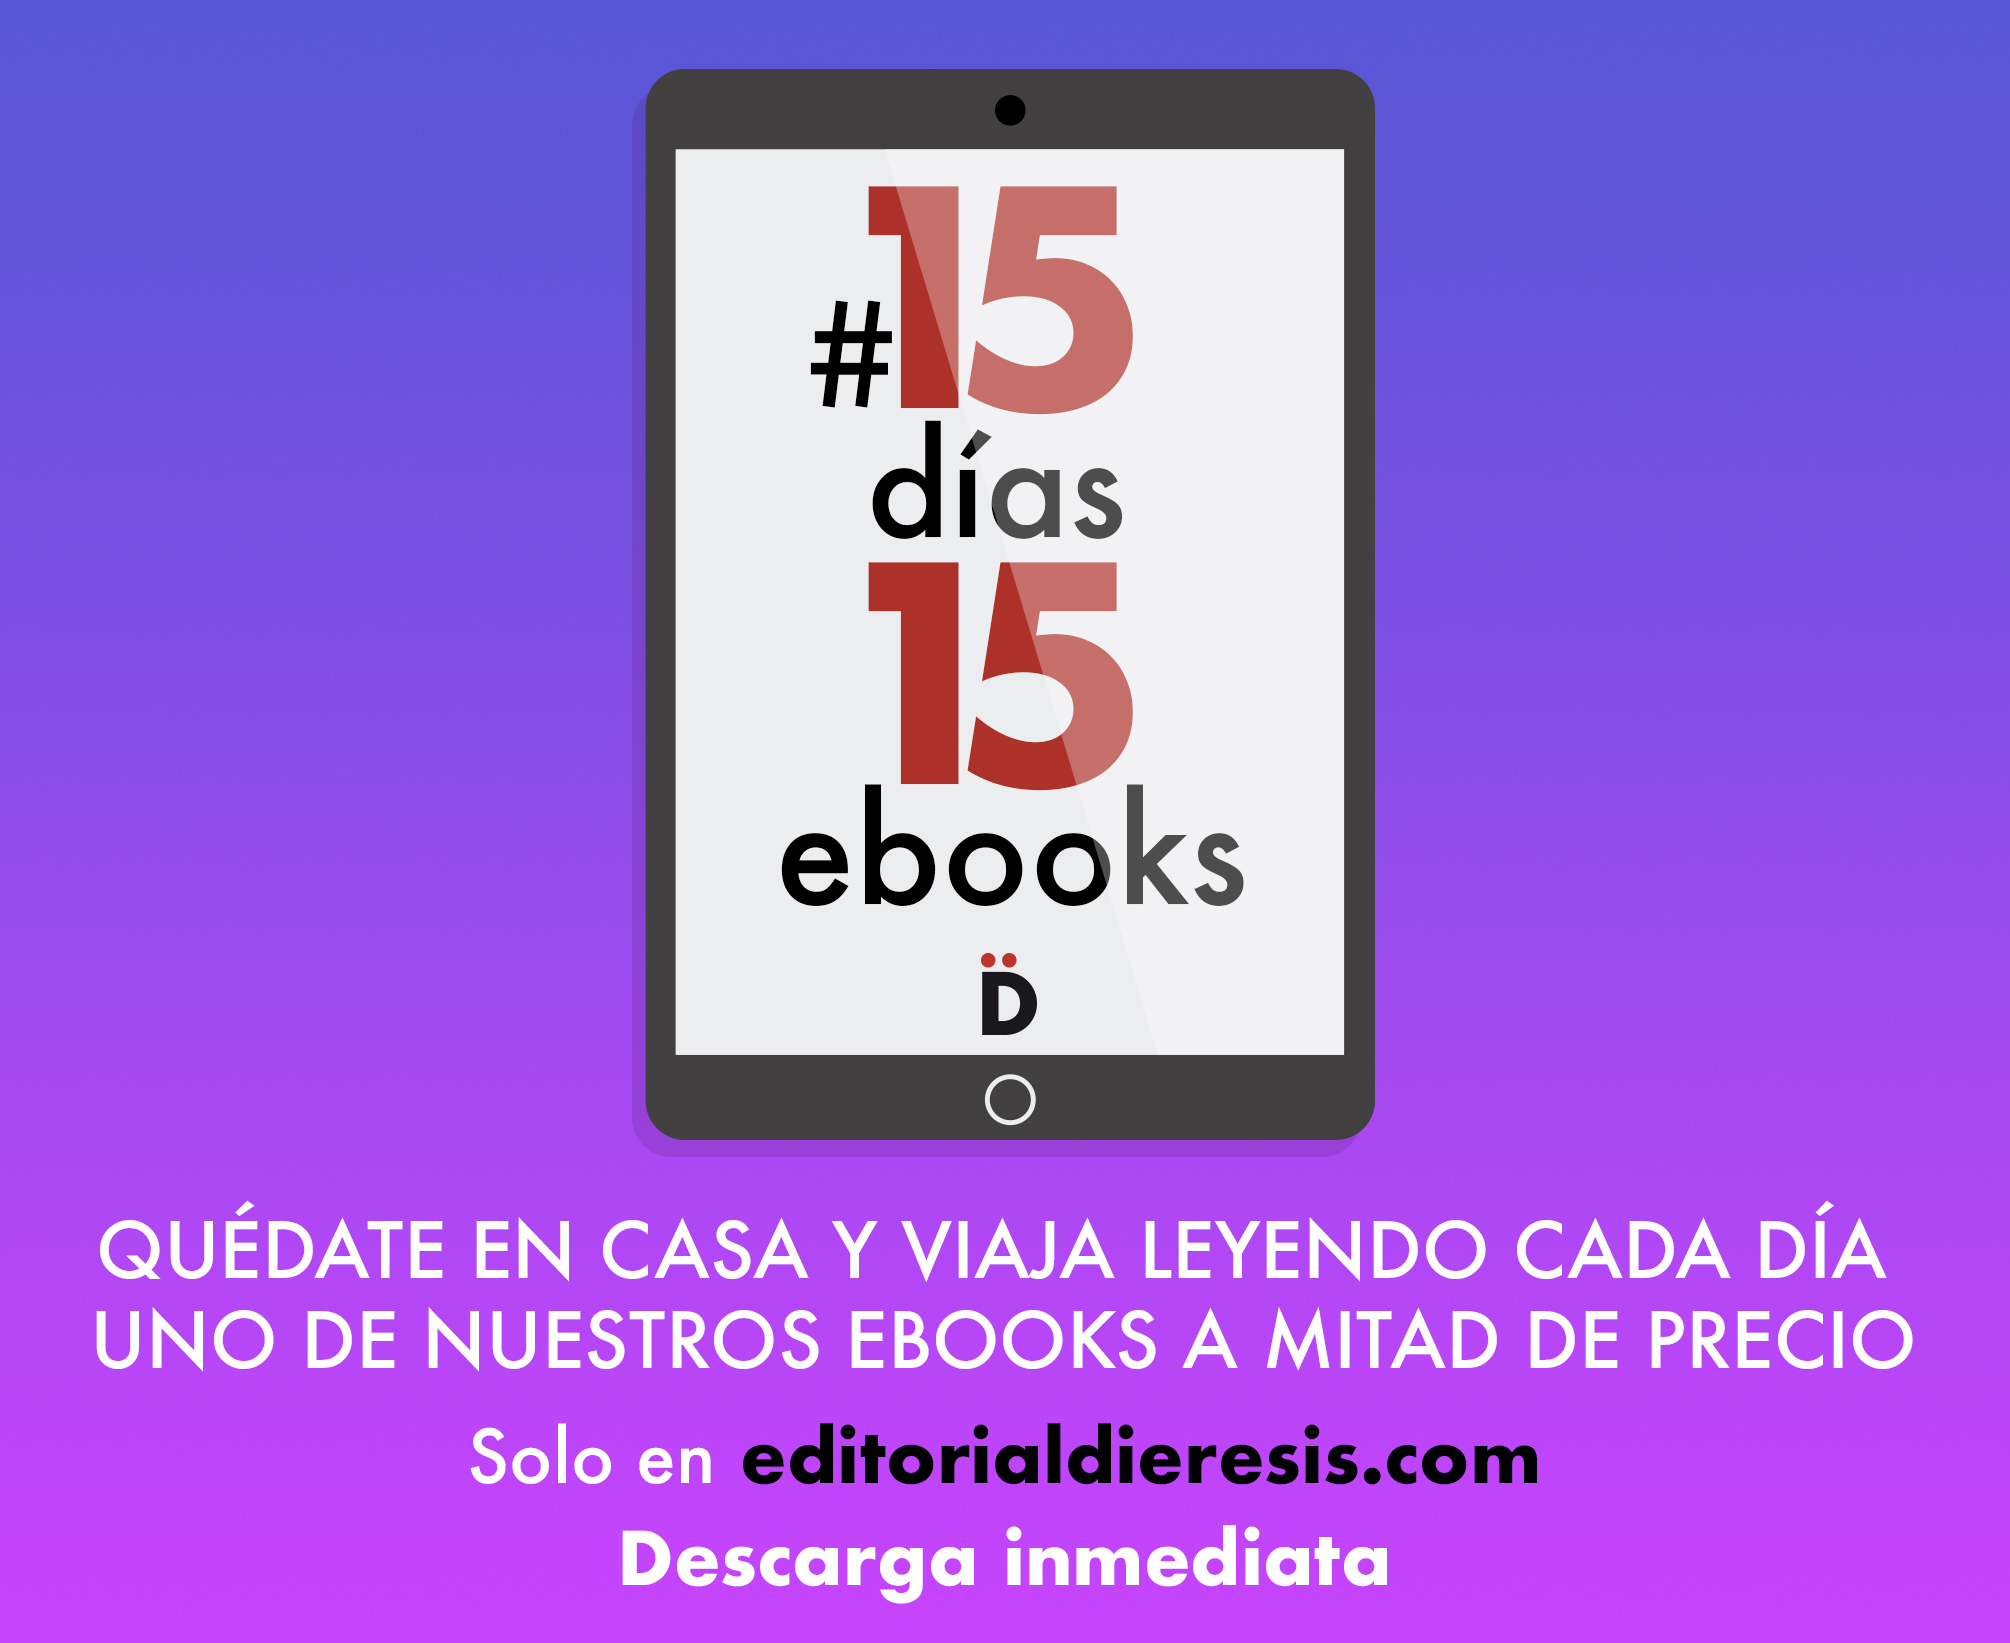 #15días15ebooks: siete días más de grandes lecturas